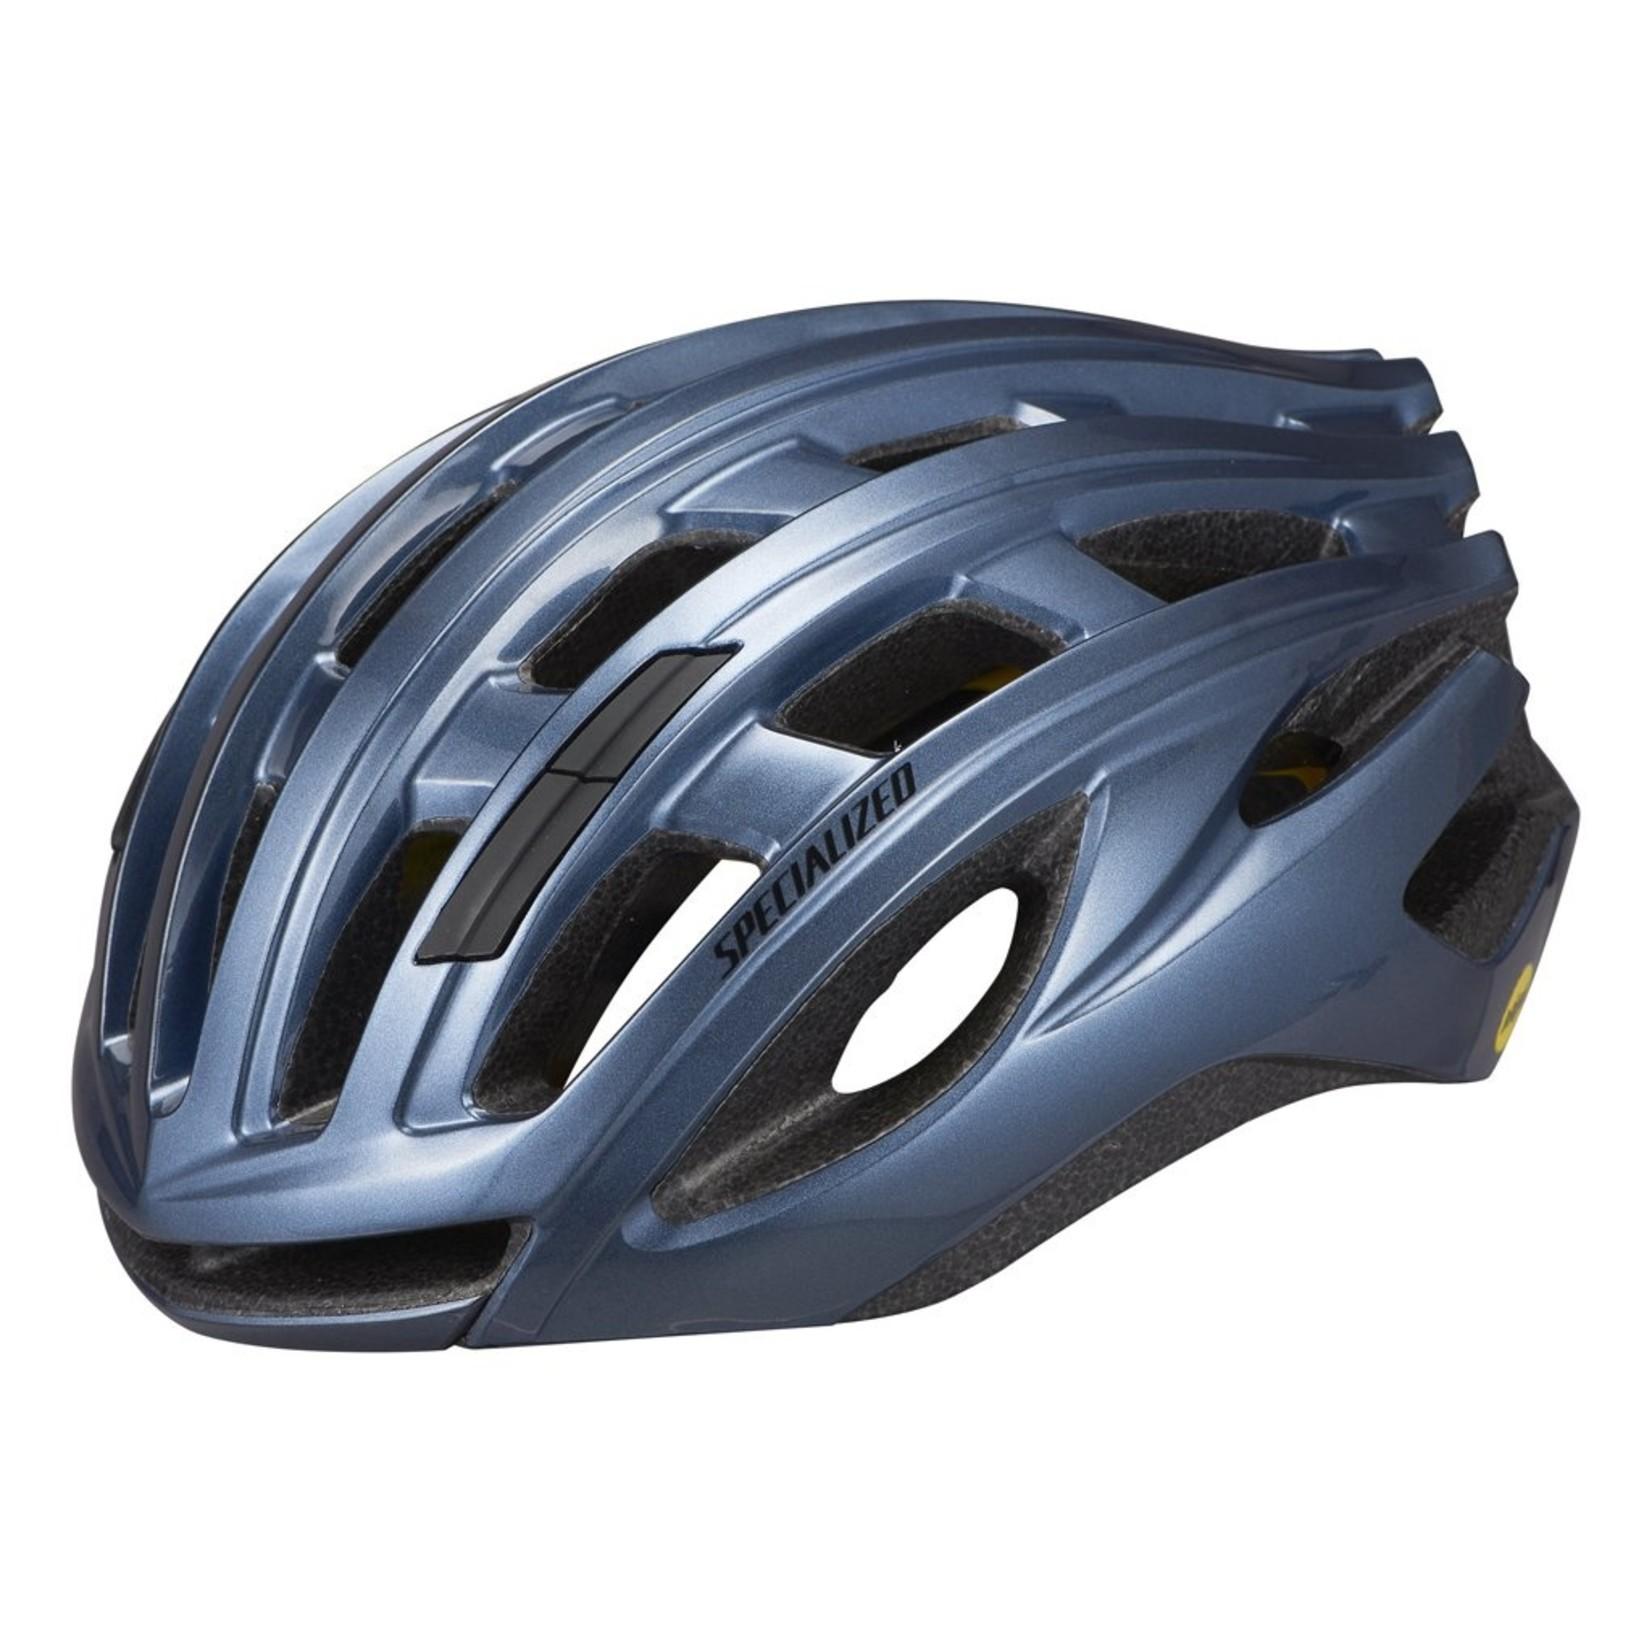 Specialized Specialized Propero 3 ANGI Road Helmet